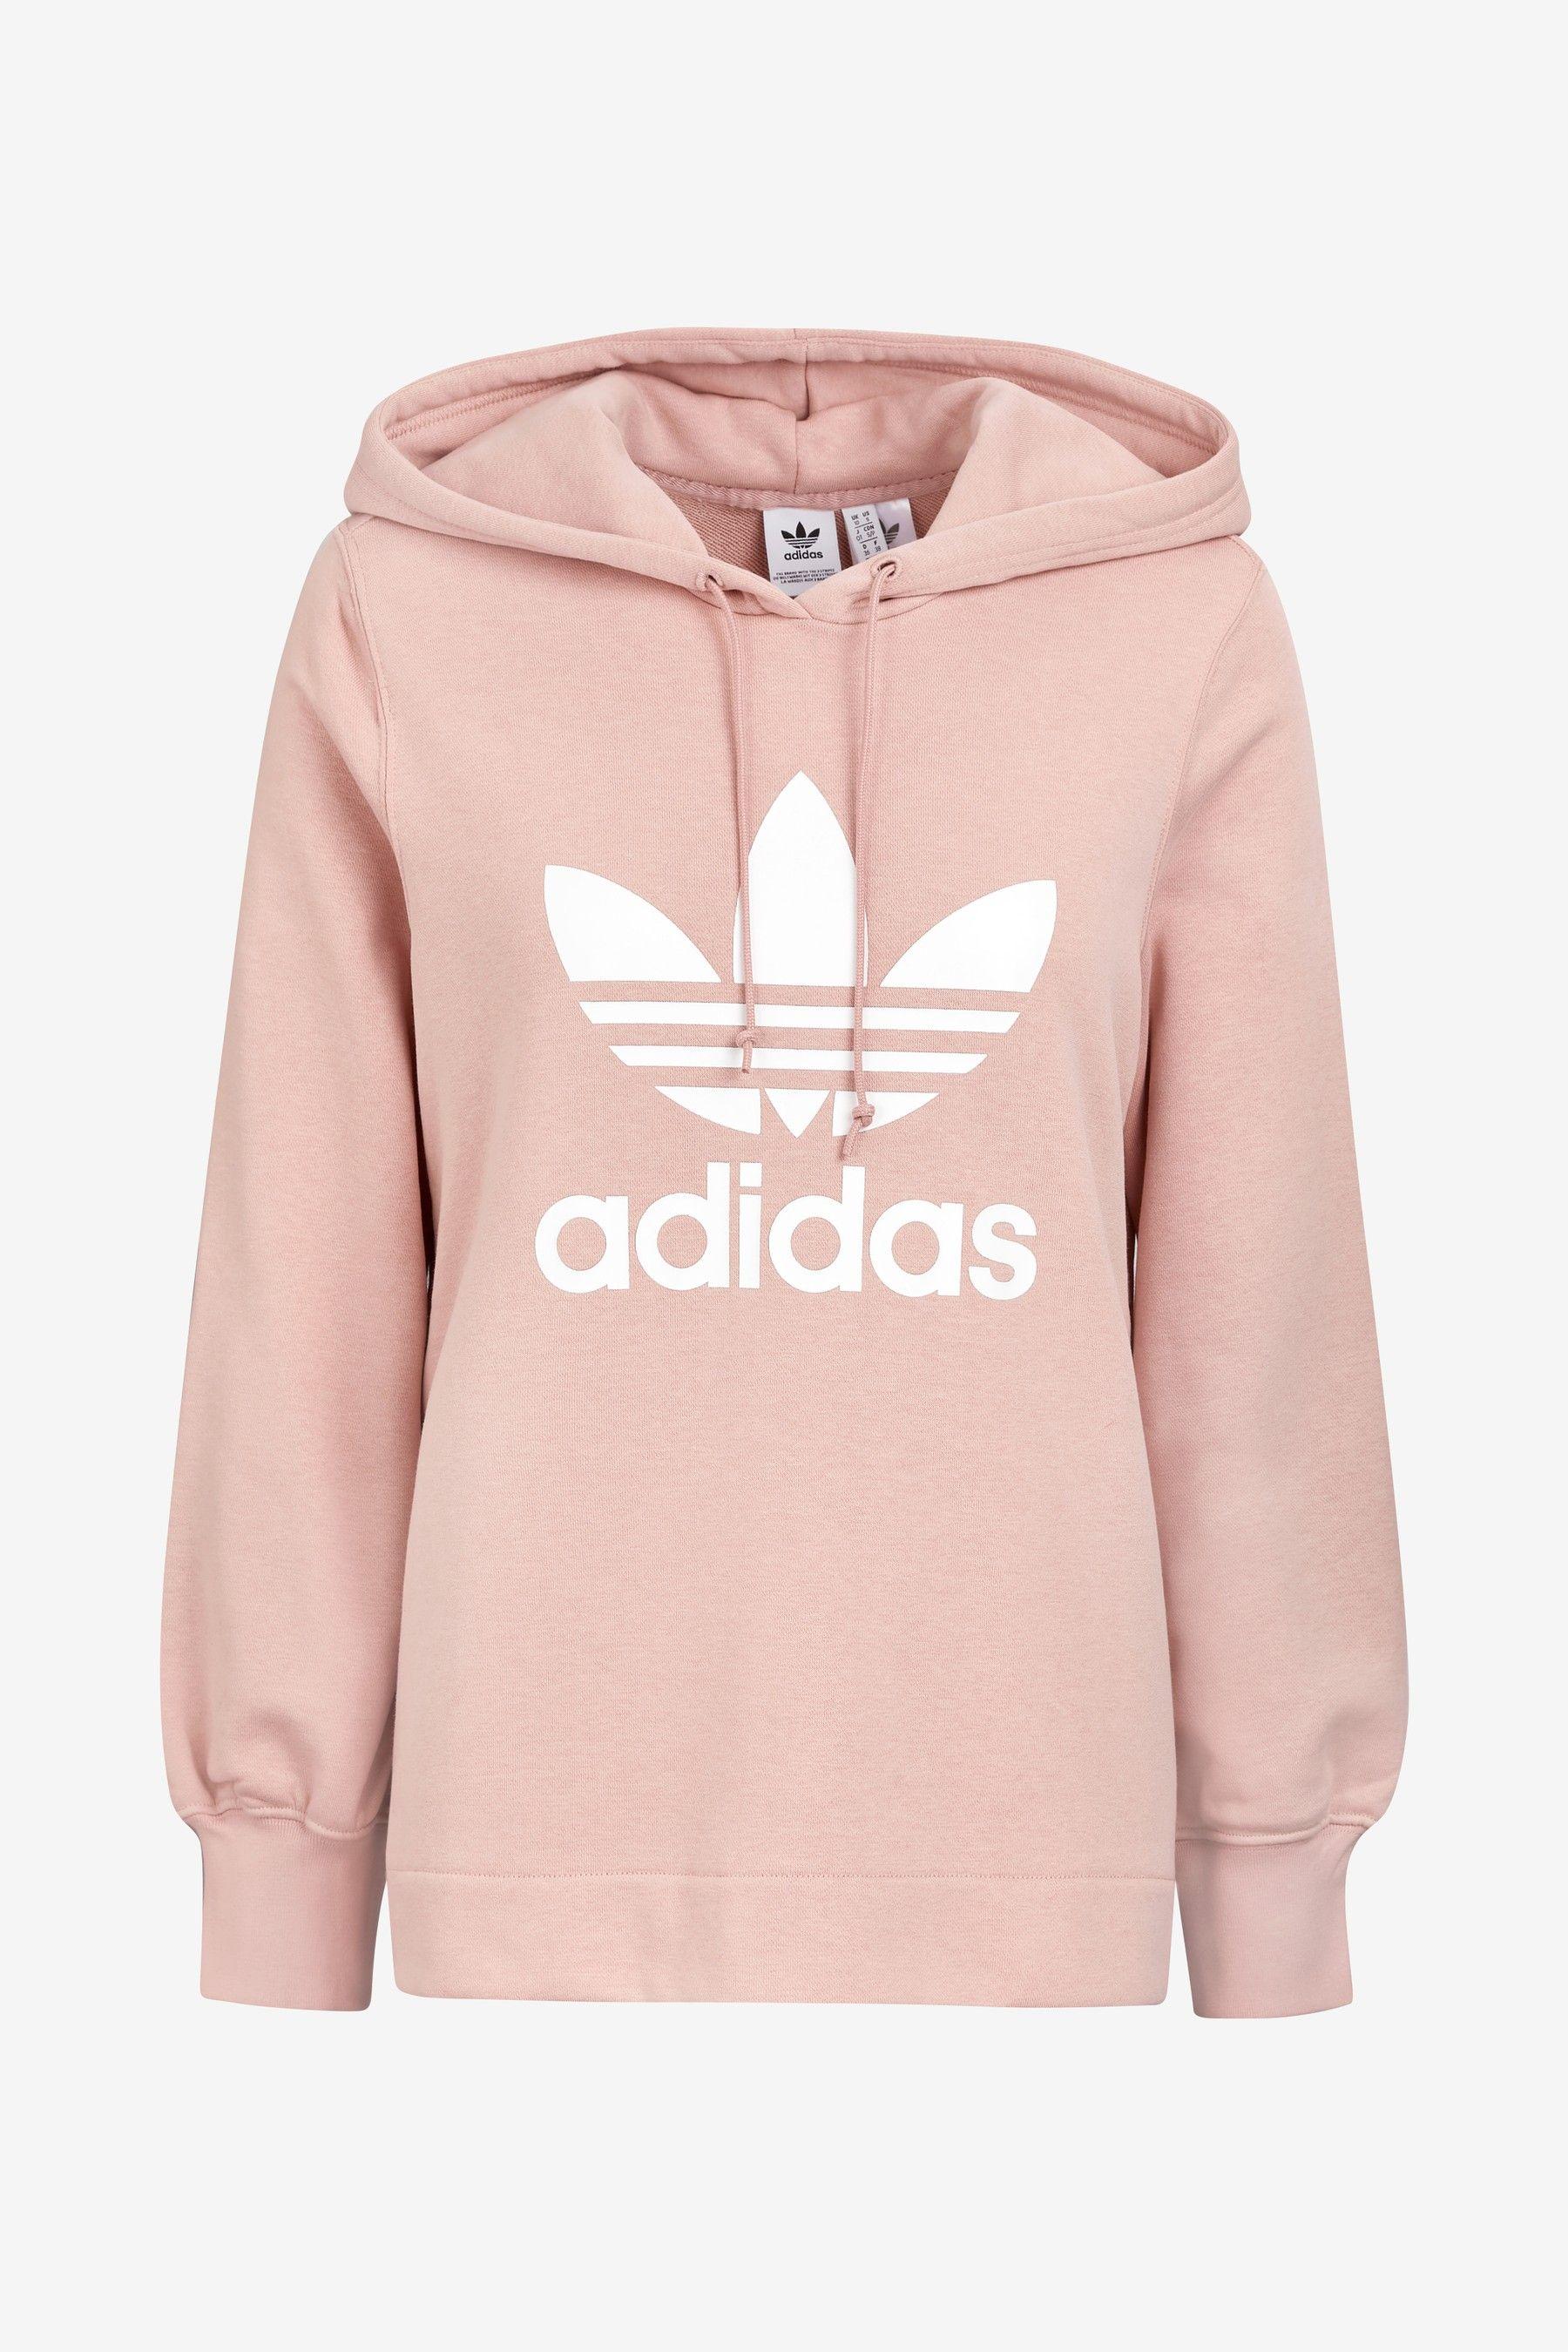 Womens adidas Originals Pink Detailed Overhead Hoody Pink